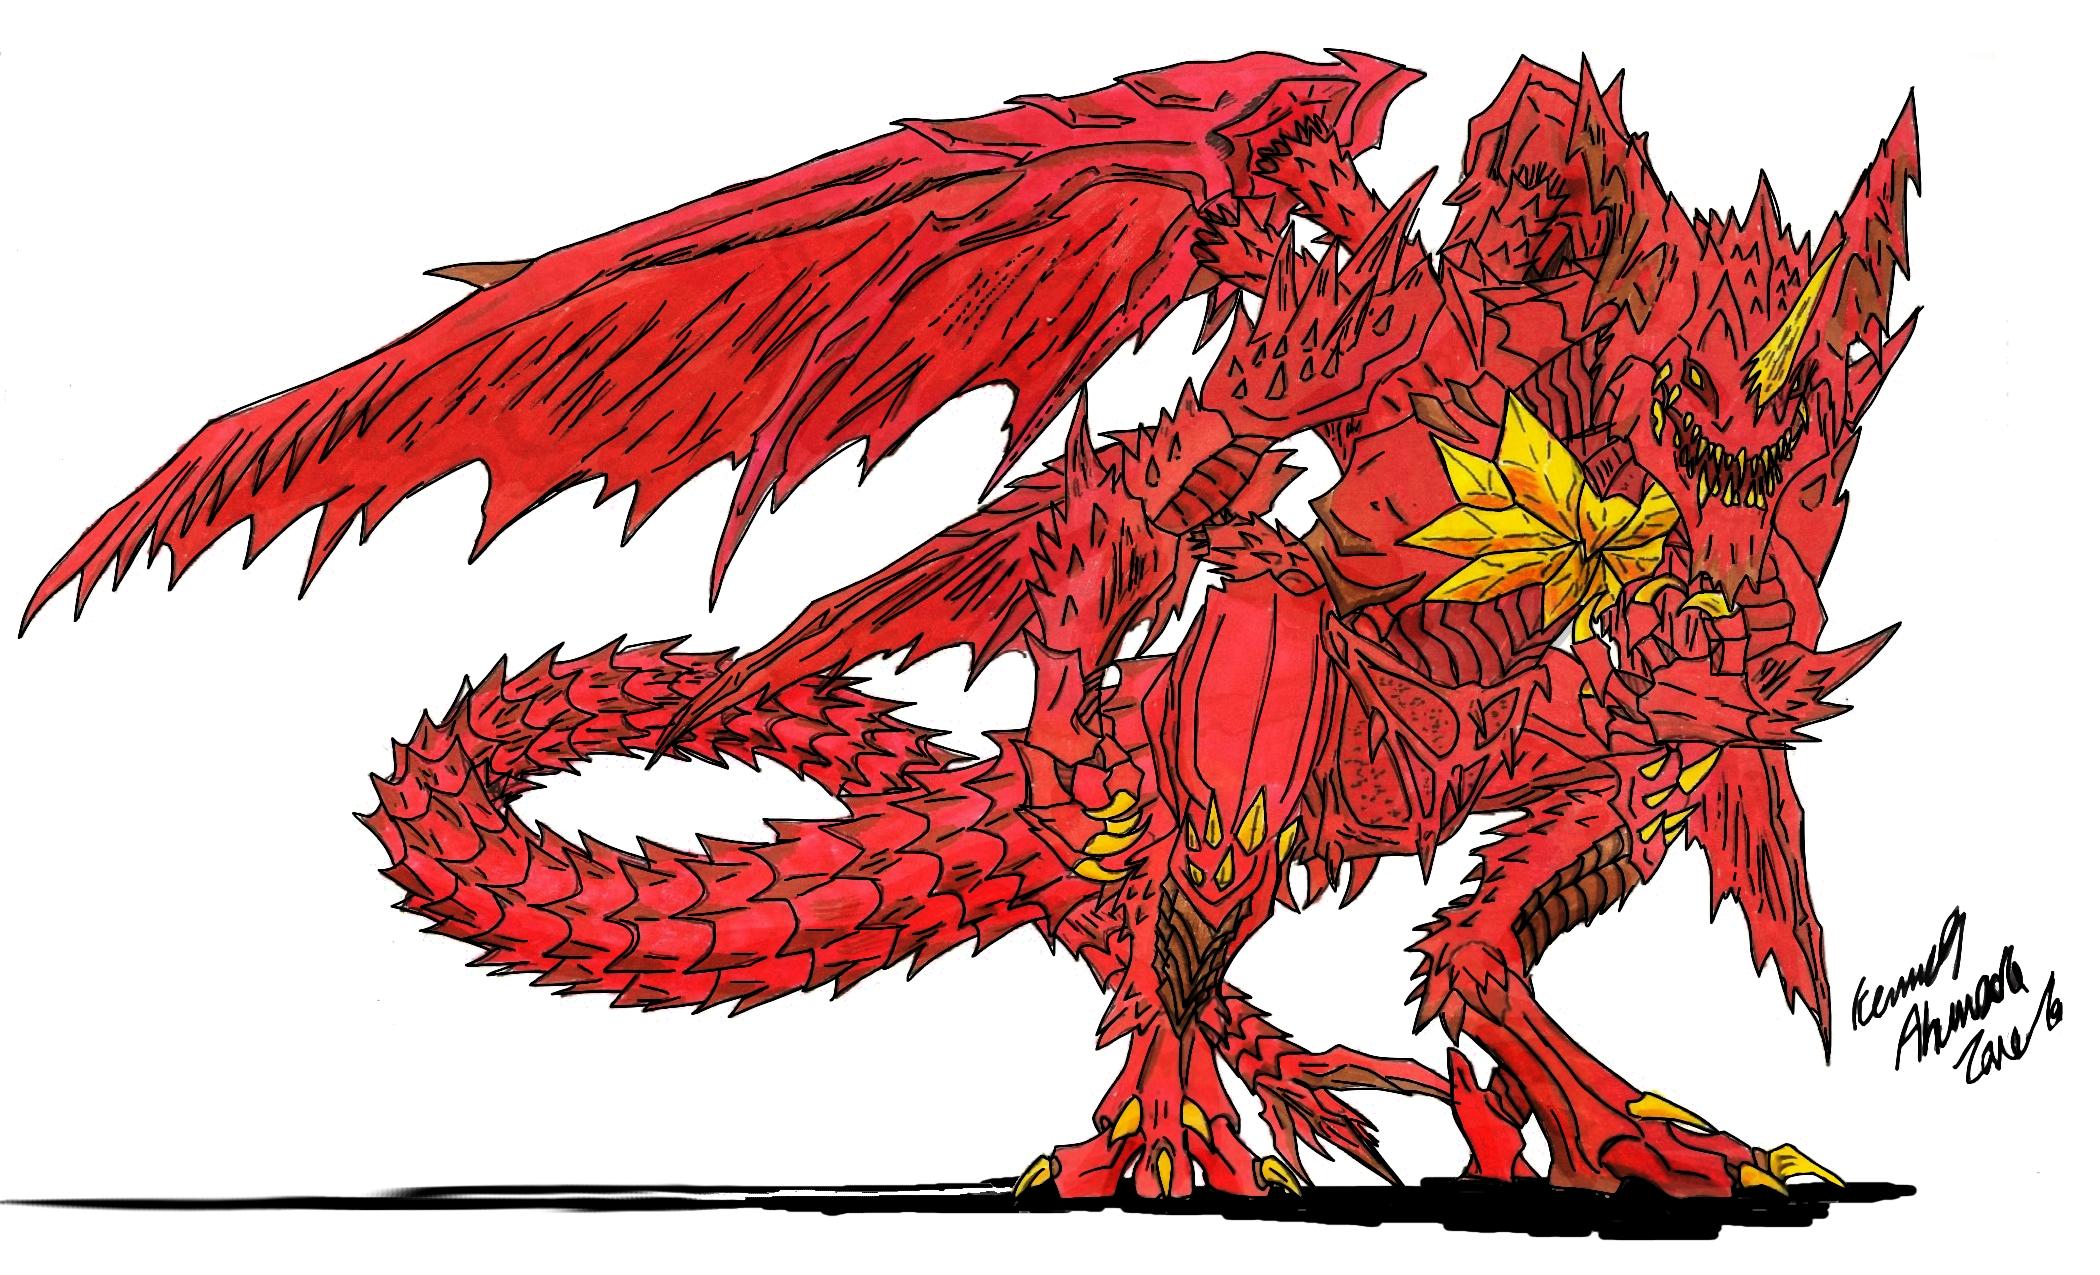 Neo Daikaiju-DESTROYAH 3 by Dino-master on DeviantArt